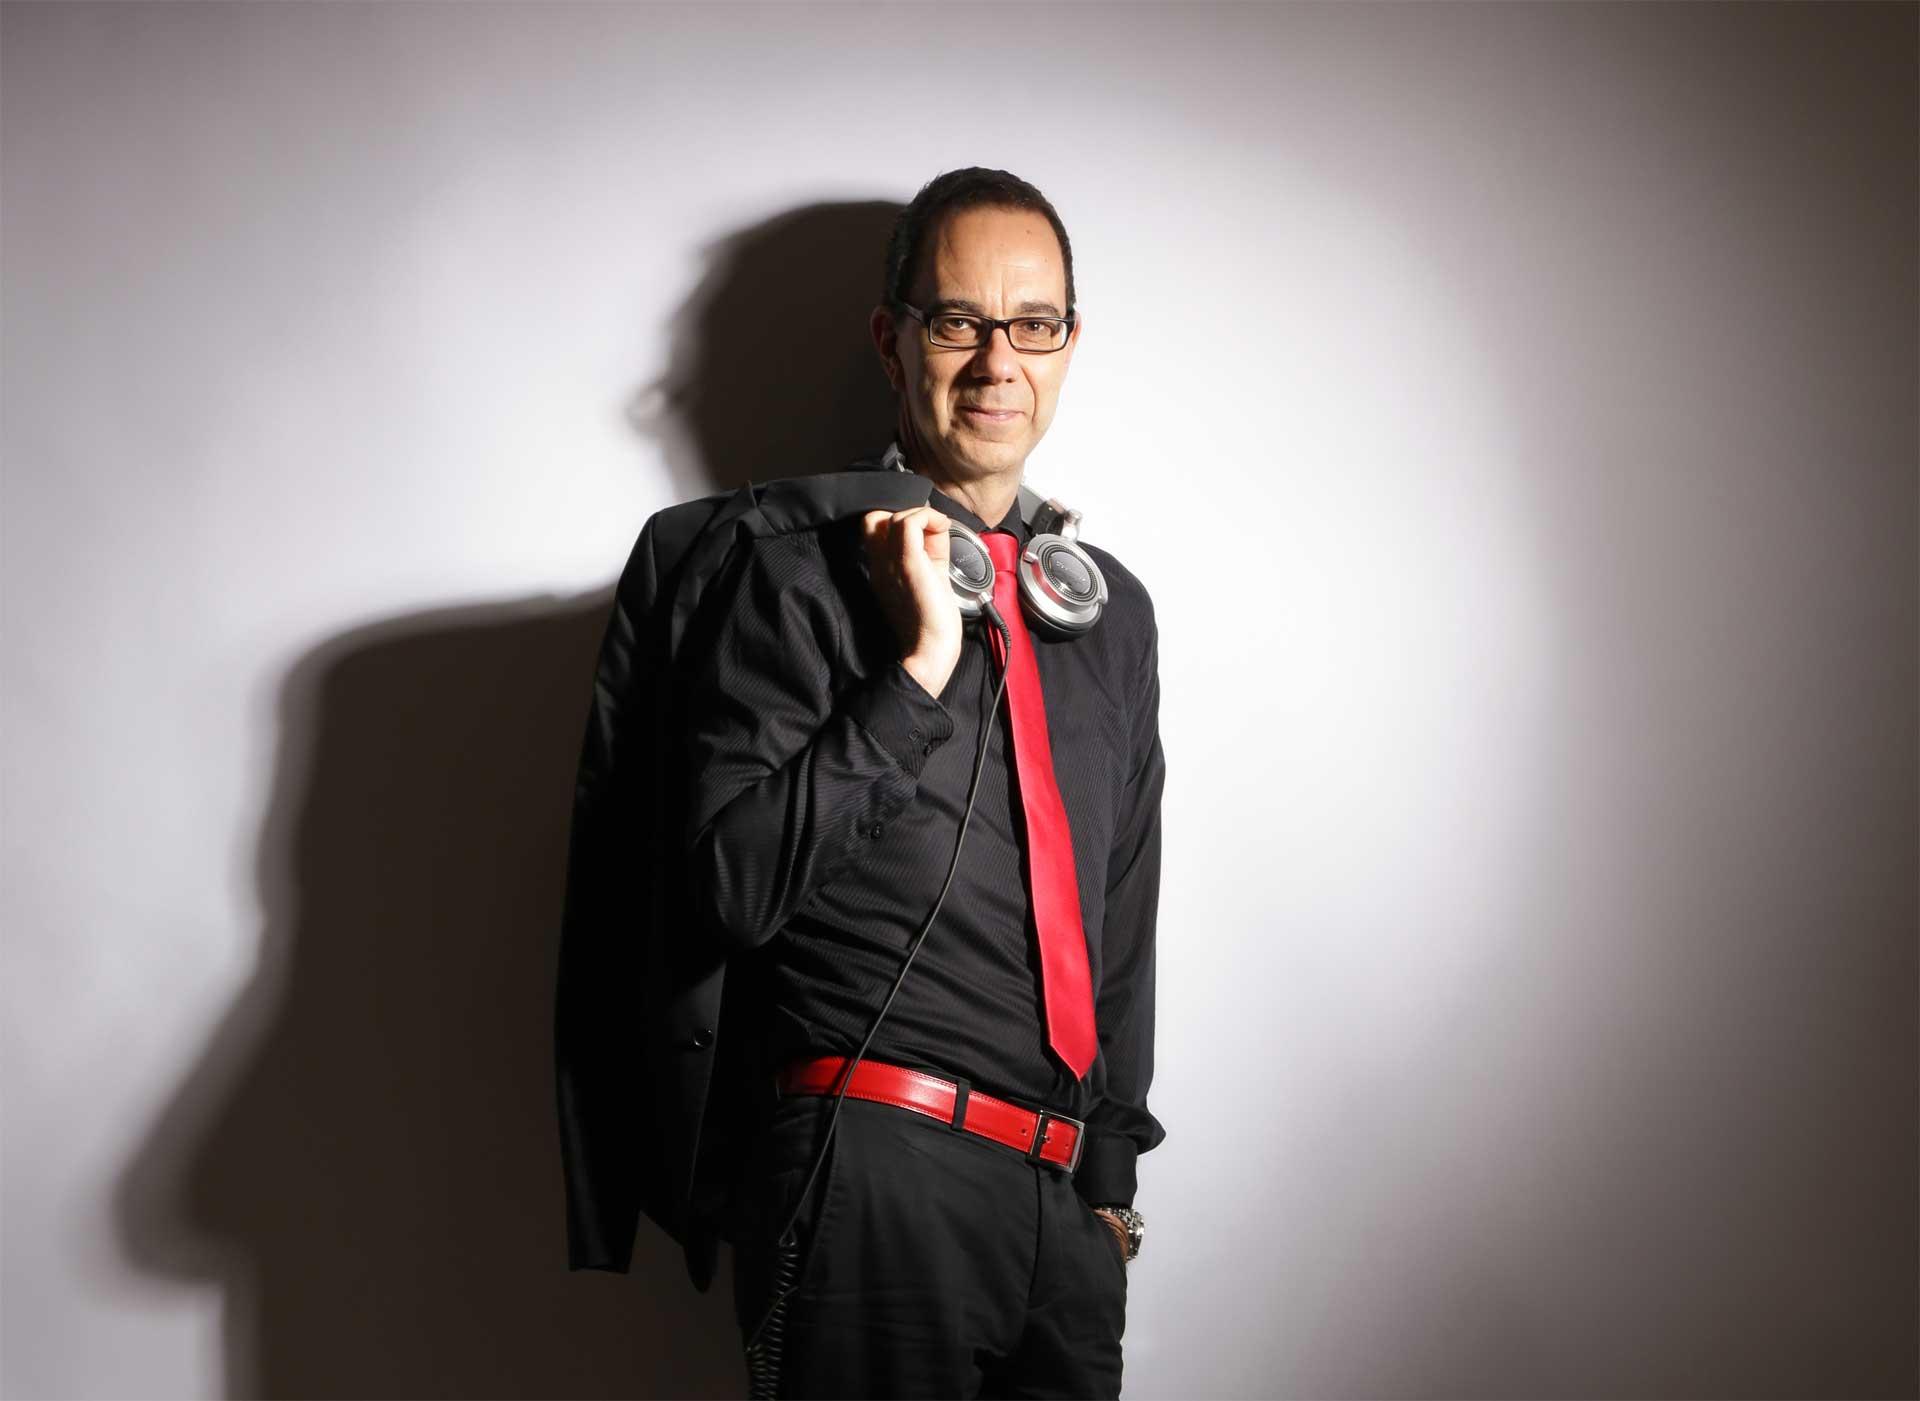 DJ Franklin aus Bochum für NRW